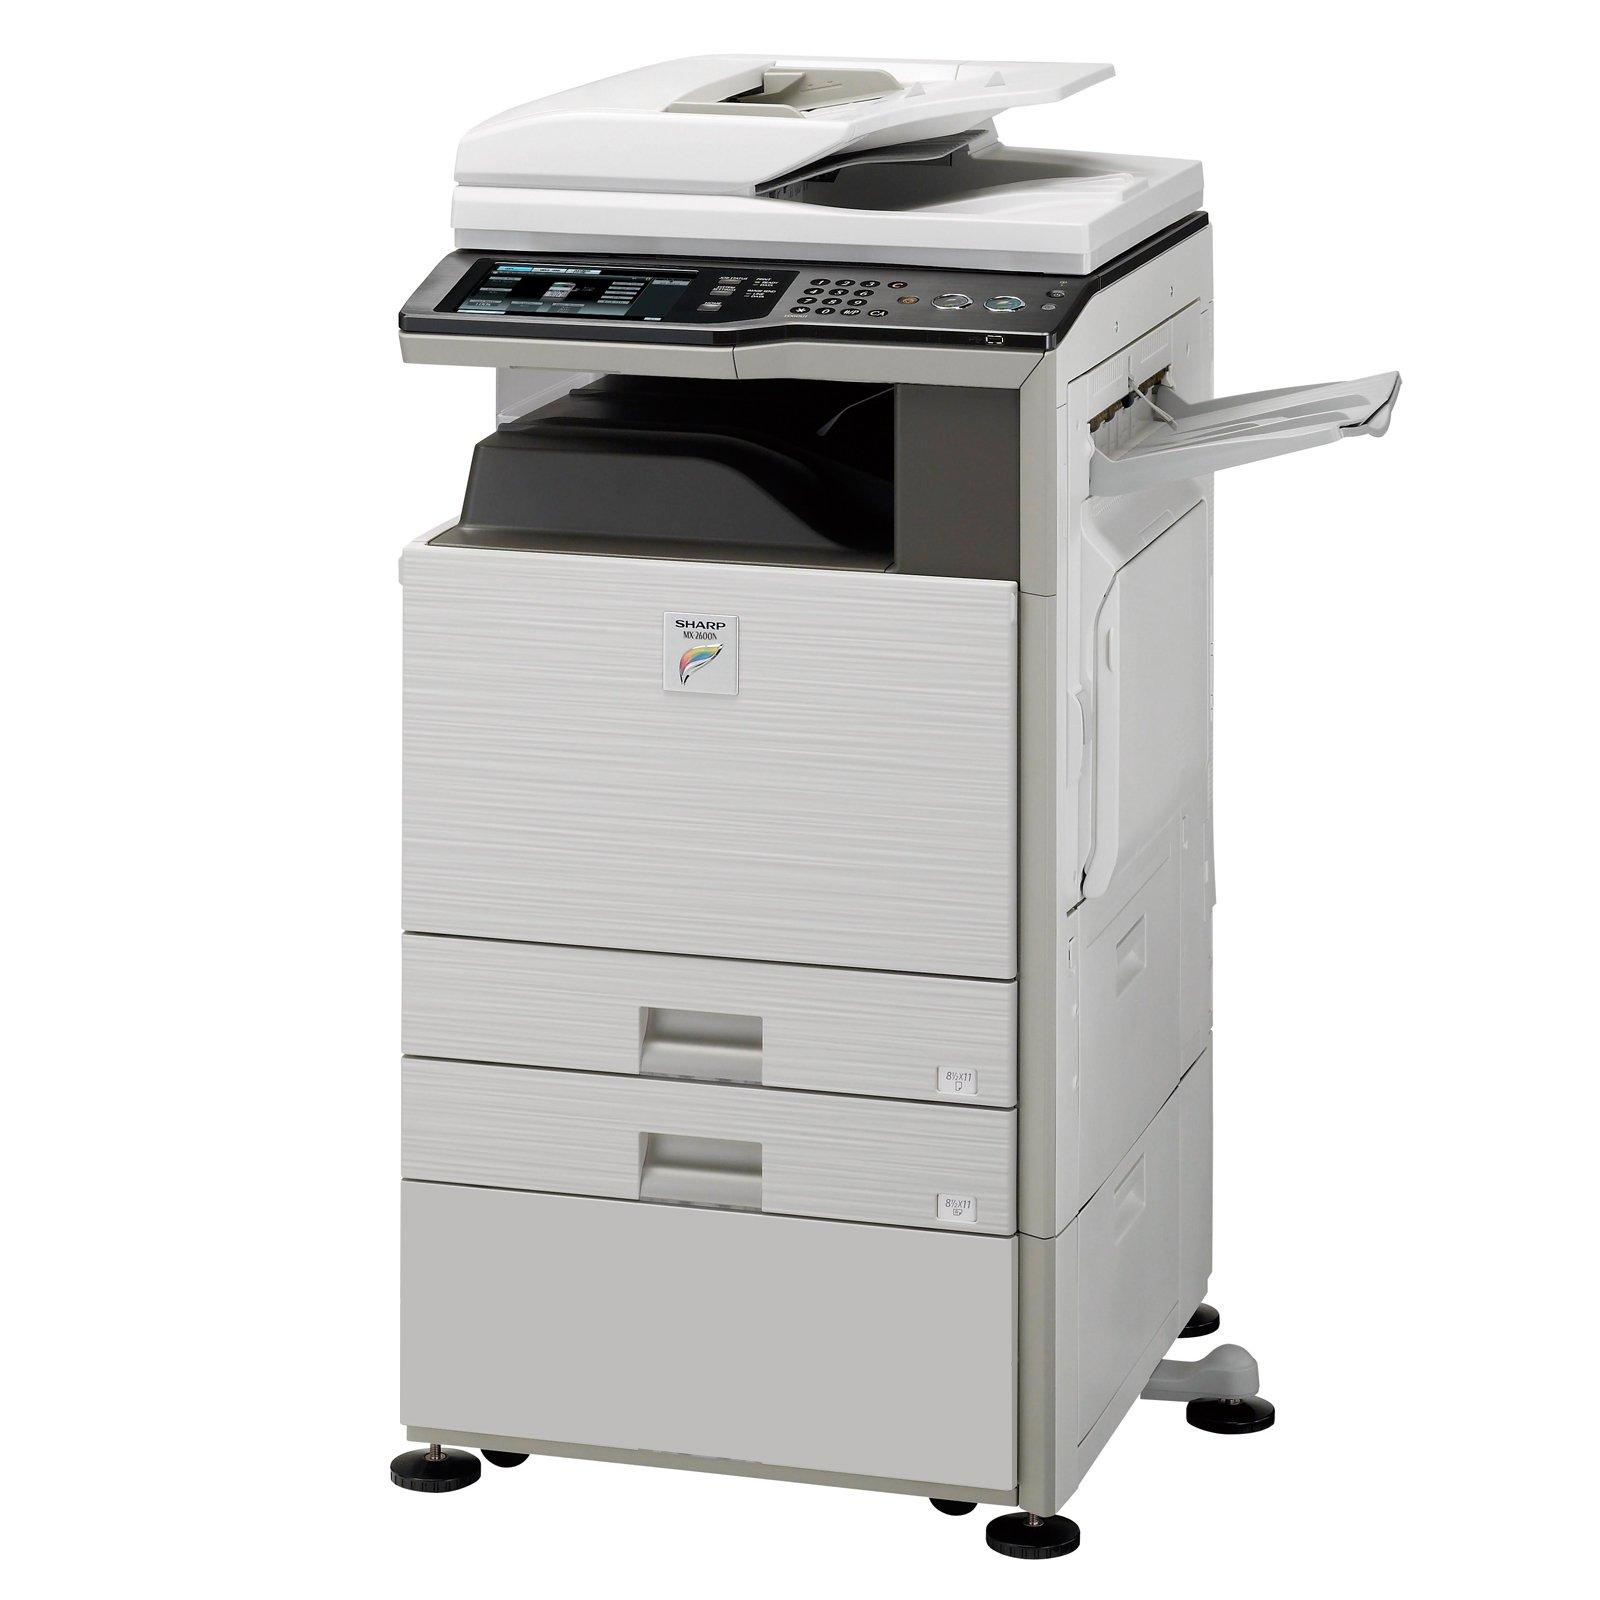 Amazon.com: Sharp MX-42N Tabloid-Size Color Laser Multifunction